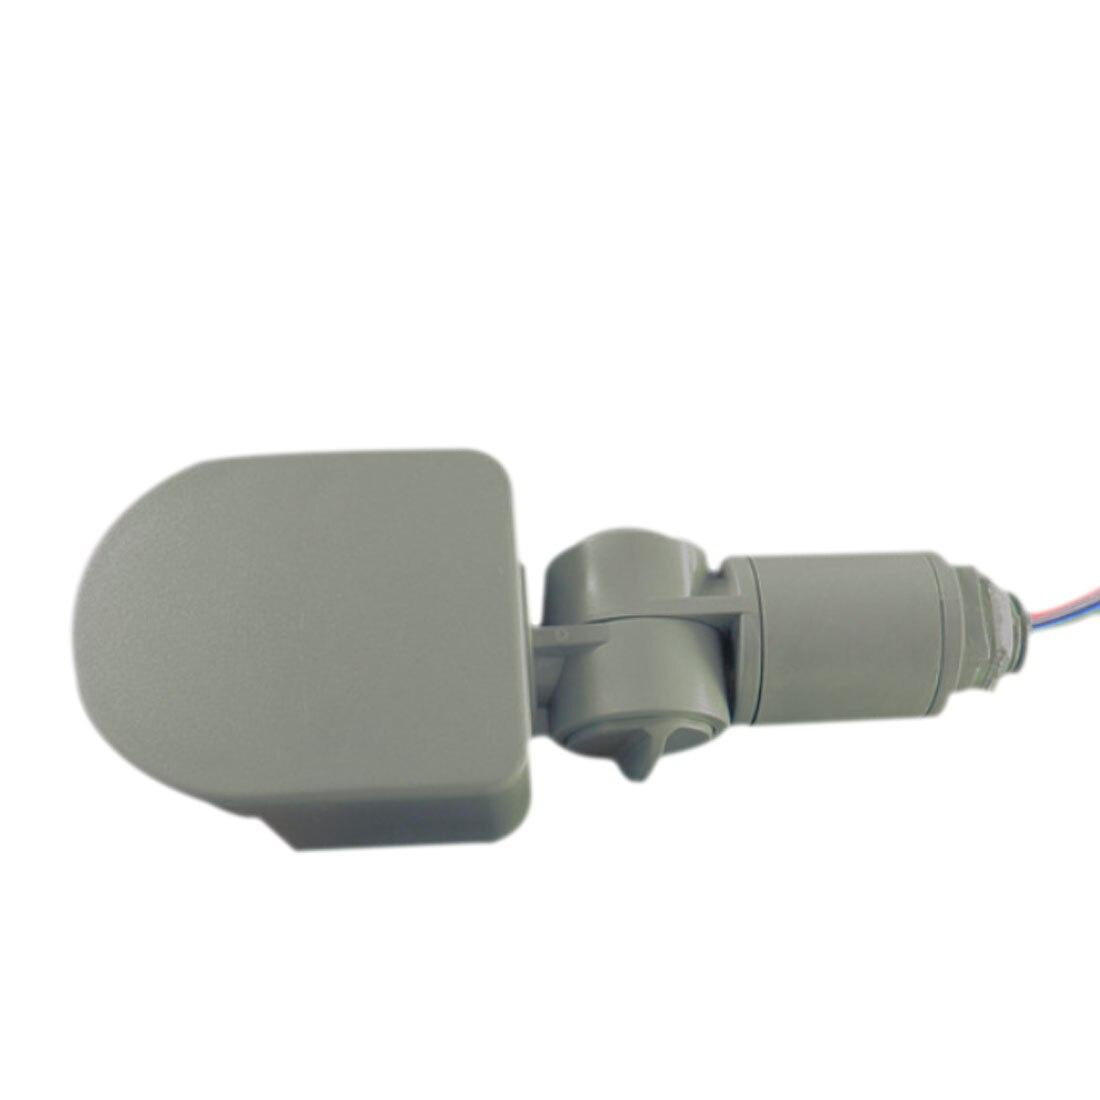 AC 220V Automatic Infrared PIR Motion Sensor Switch Motion Sensor Light Switch Outdoor for LED Light motion sensor light switch outdoor ac 220v automatic infrared pir motion sensor switches for led light 2017 high quality